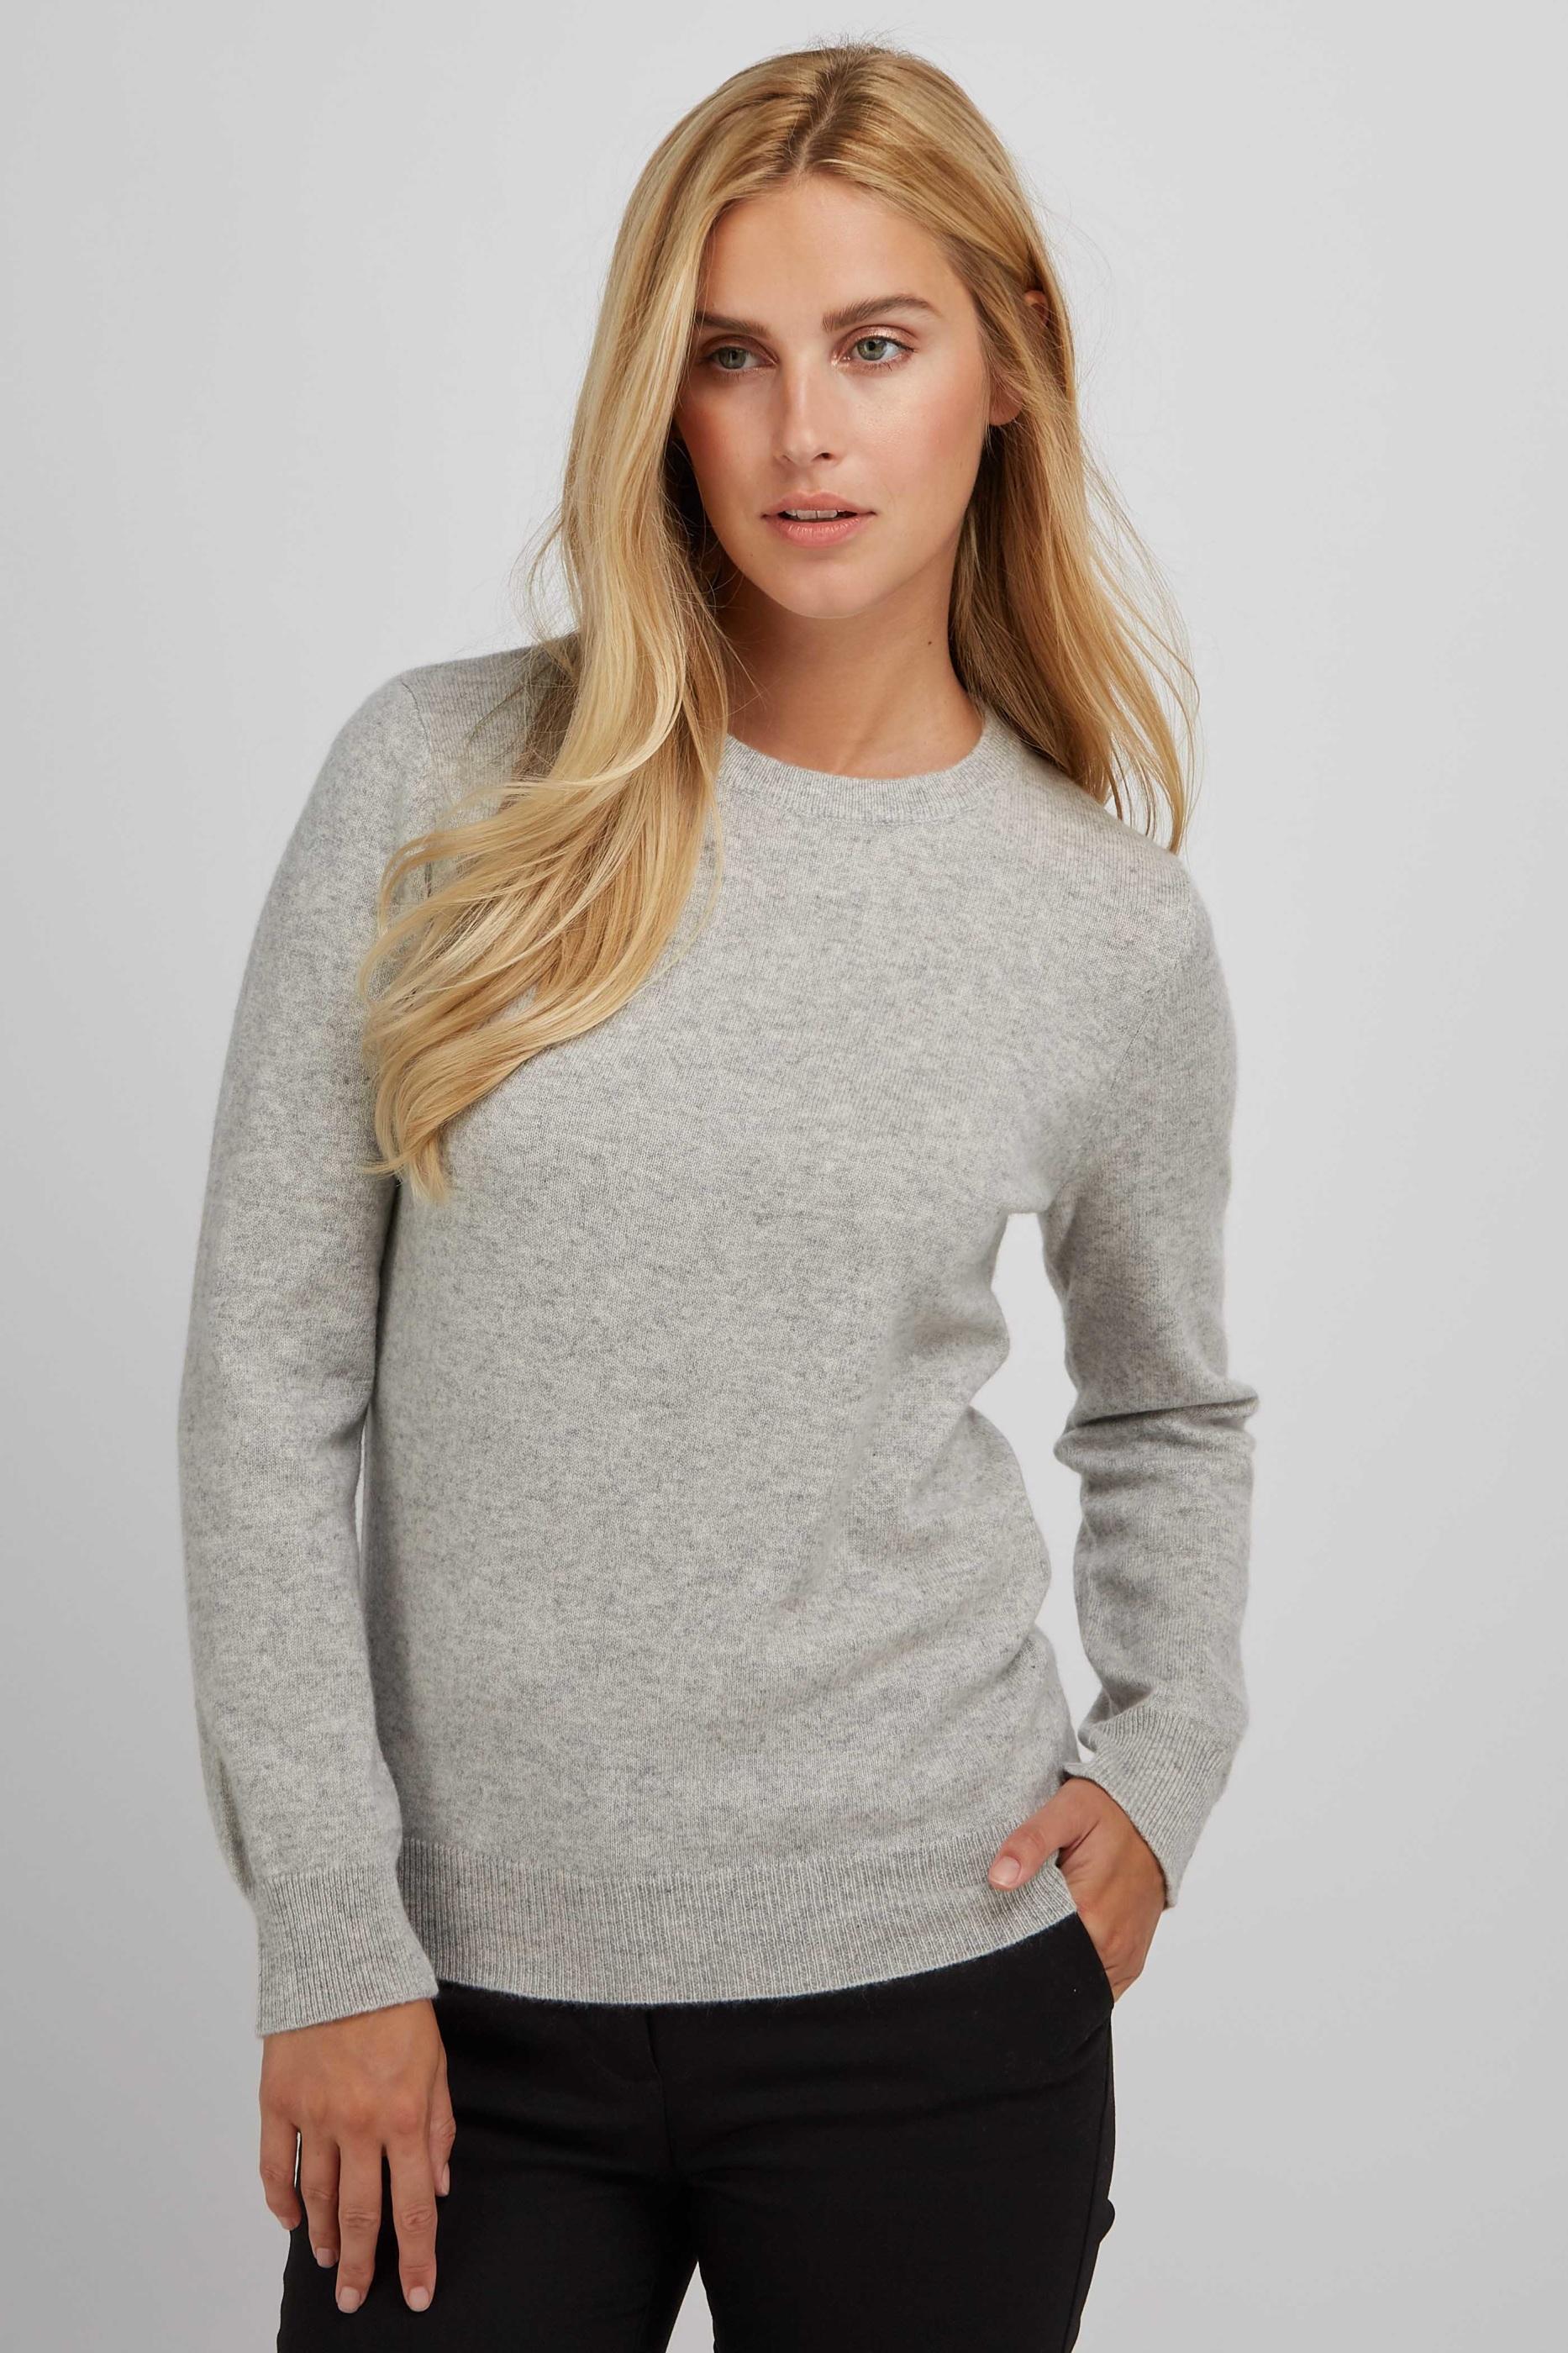 BasicSweater_LightGrey_4